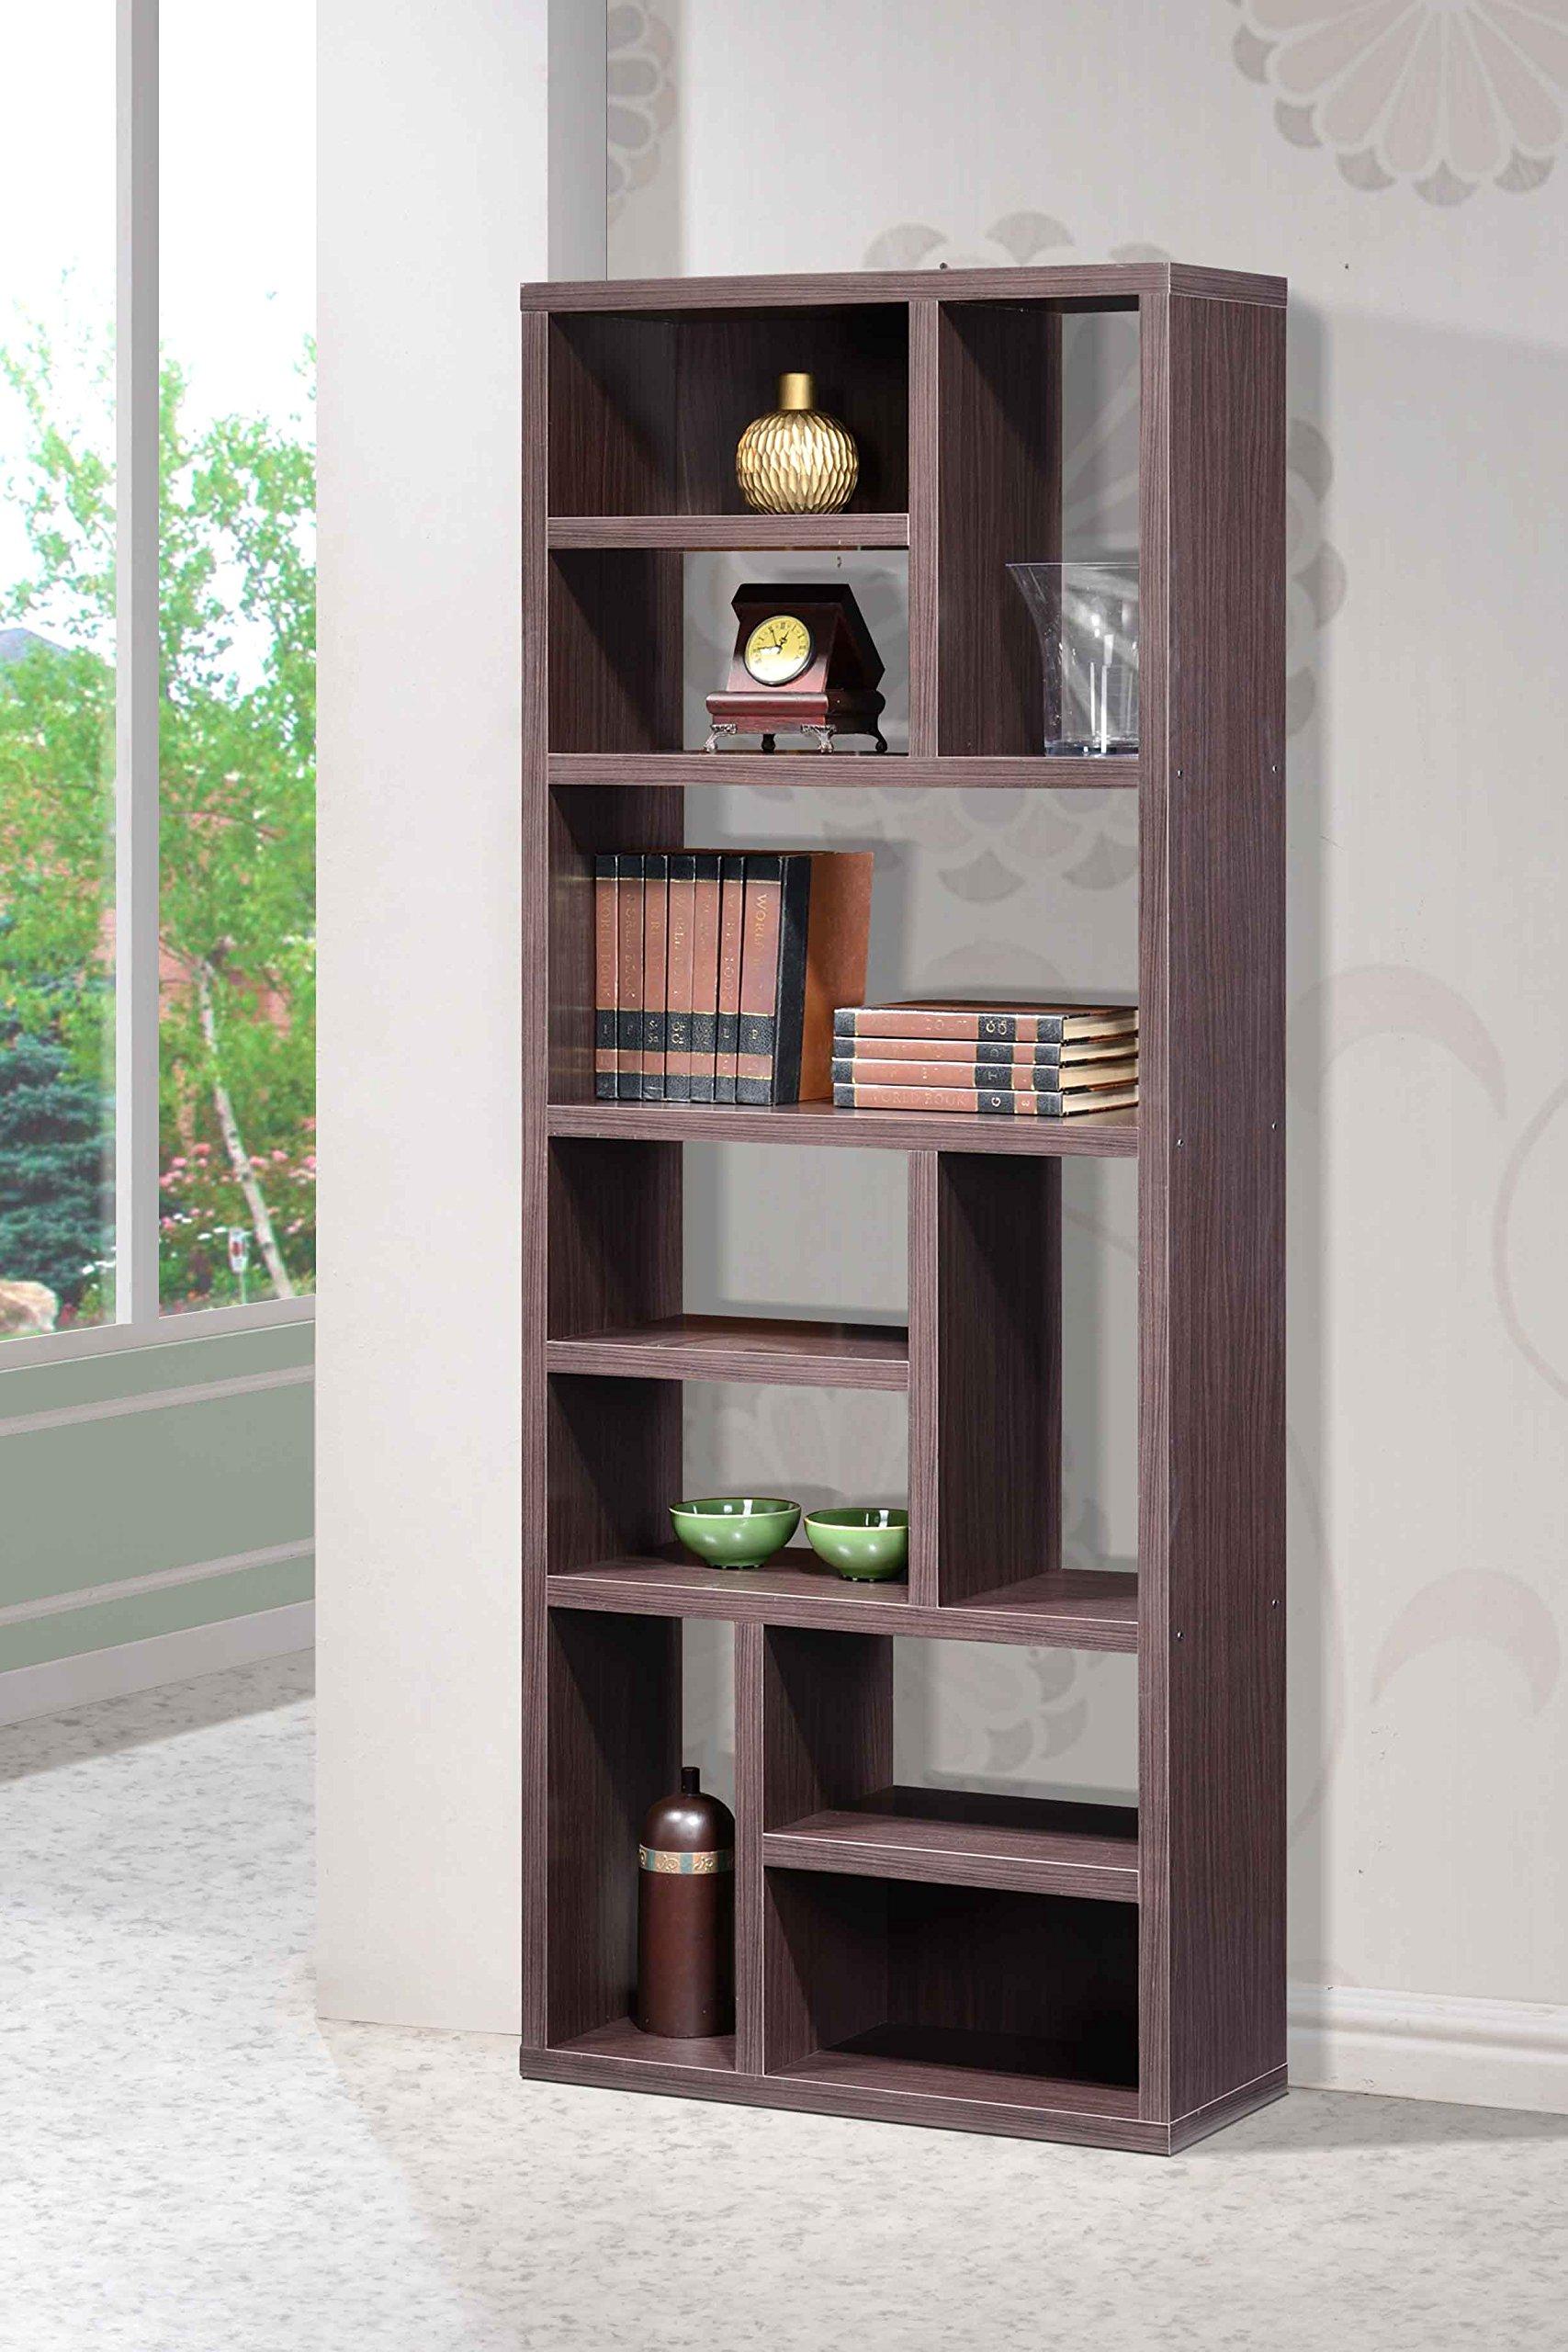 Intercon Lifestyles STUDIO Living Collection, Wall Shelving Unit, Weathered Dark Gray Finish